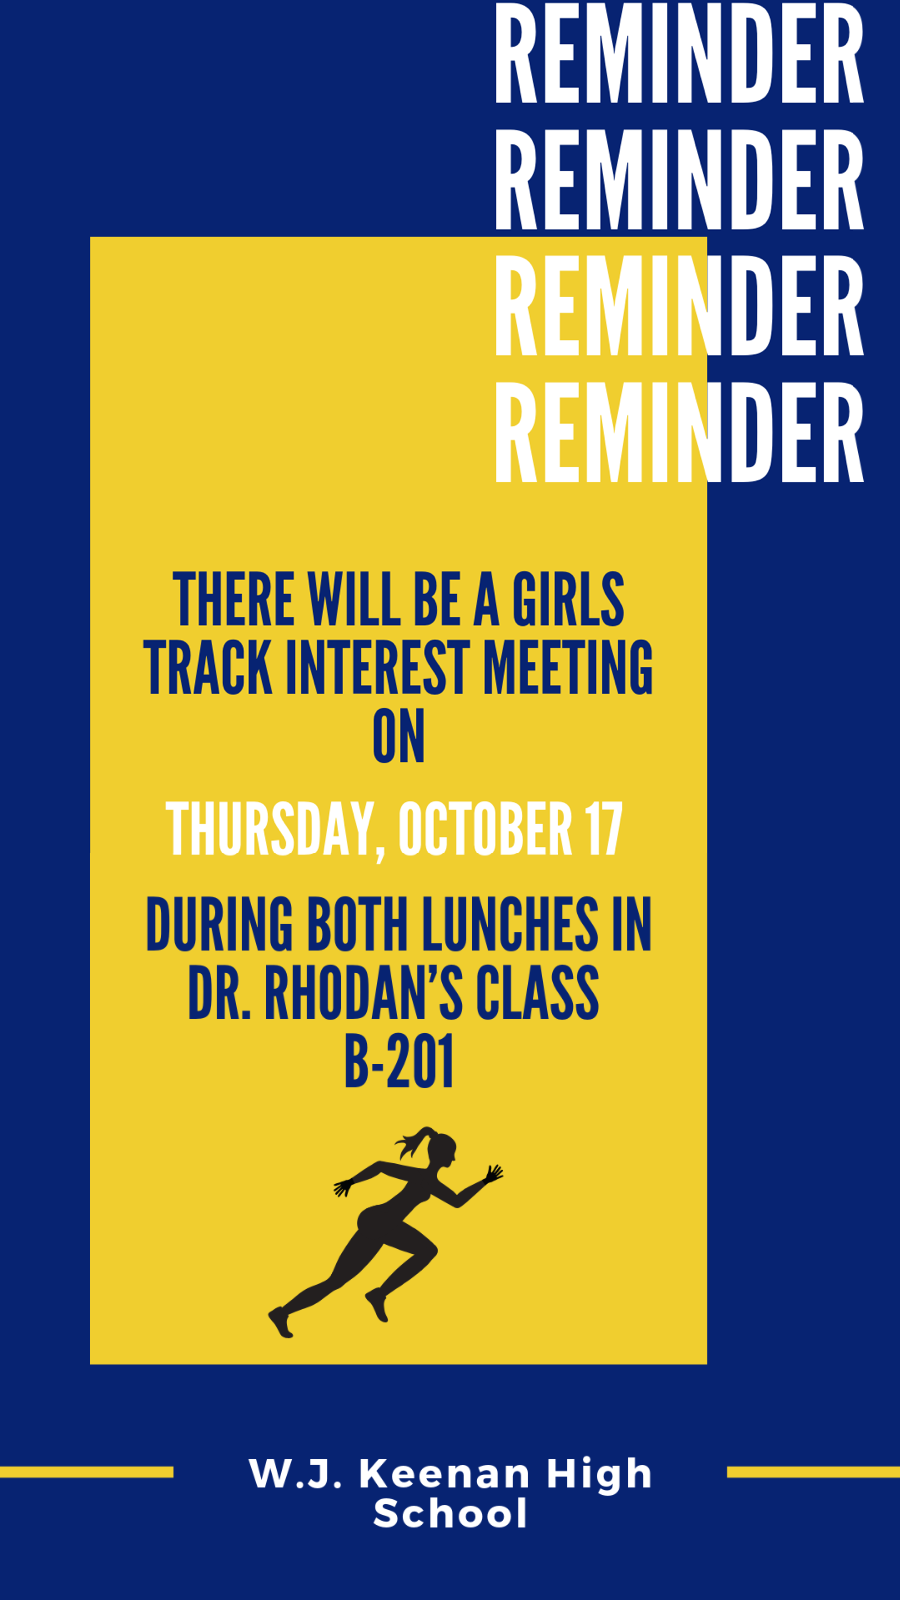 Girls Track Interest Meeting